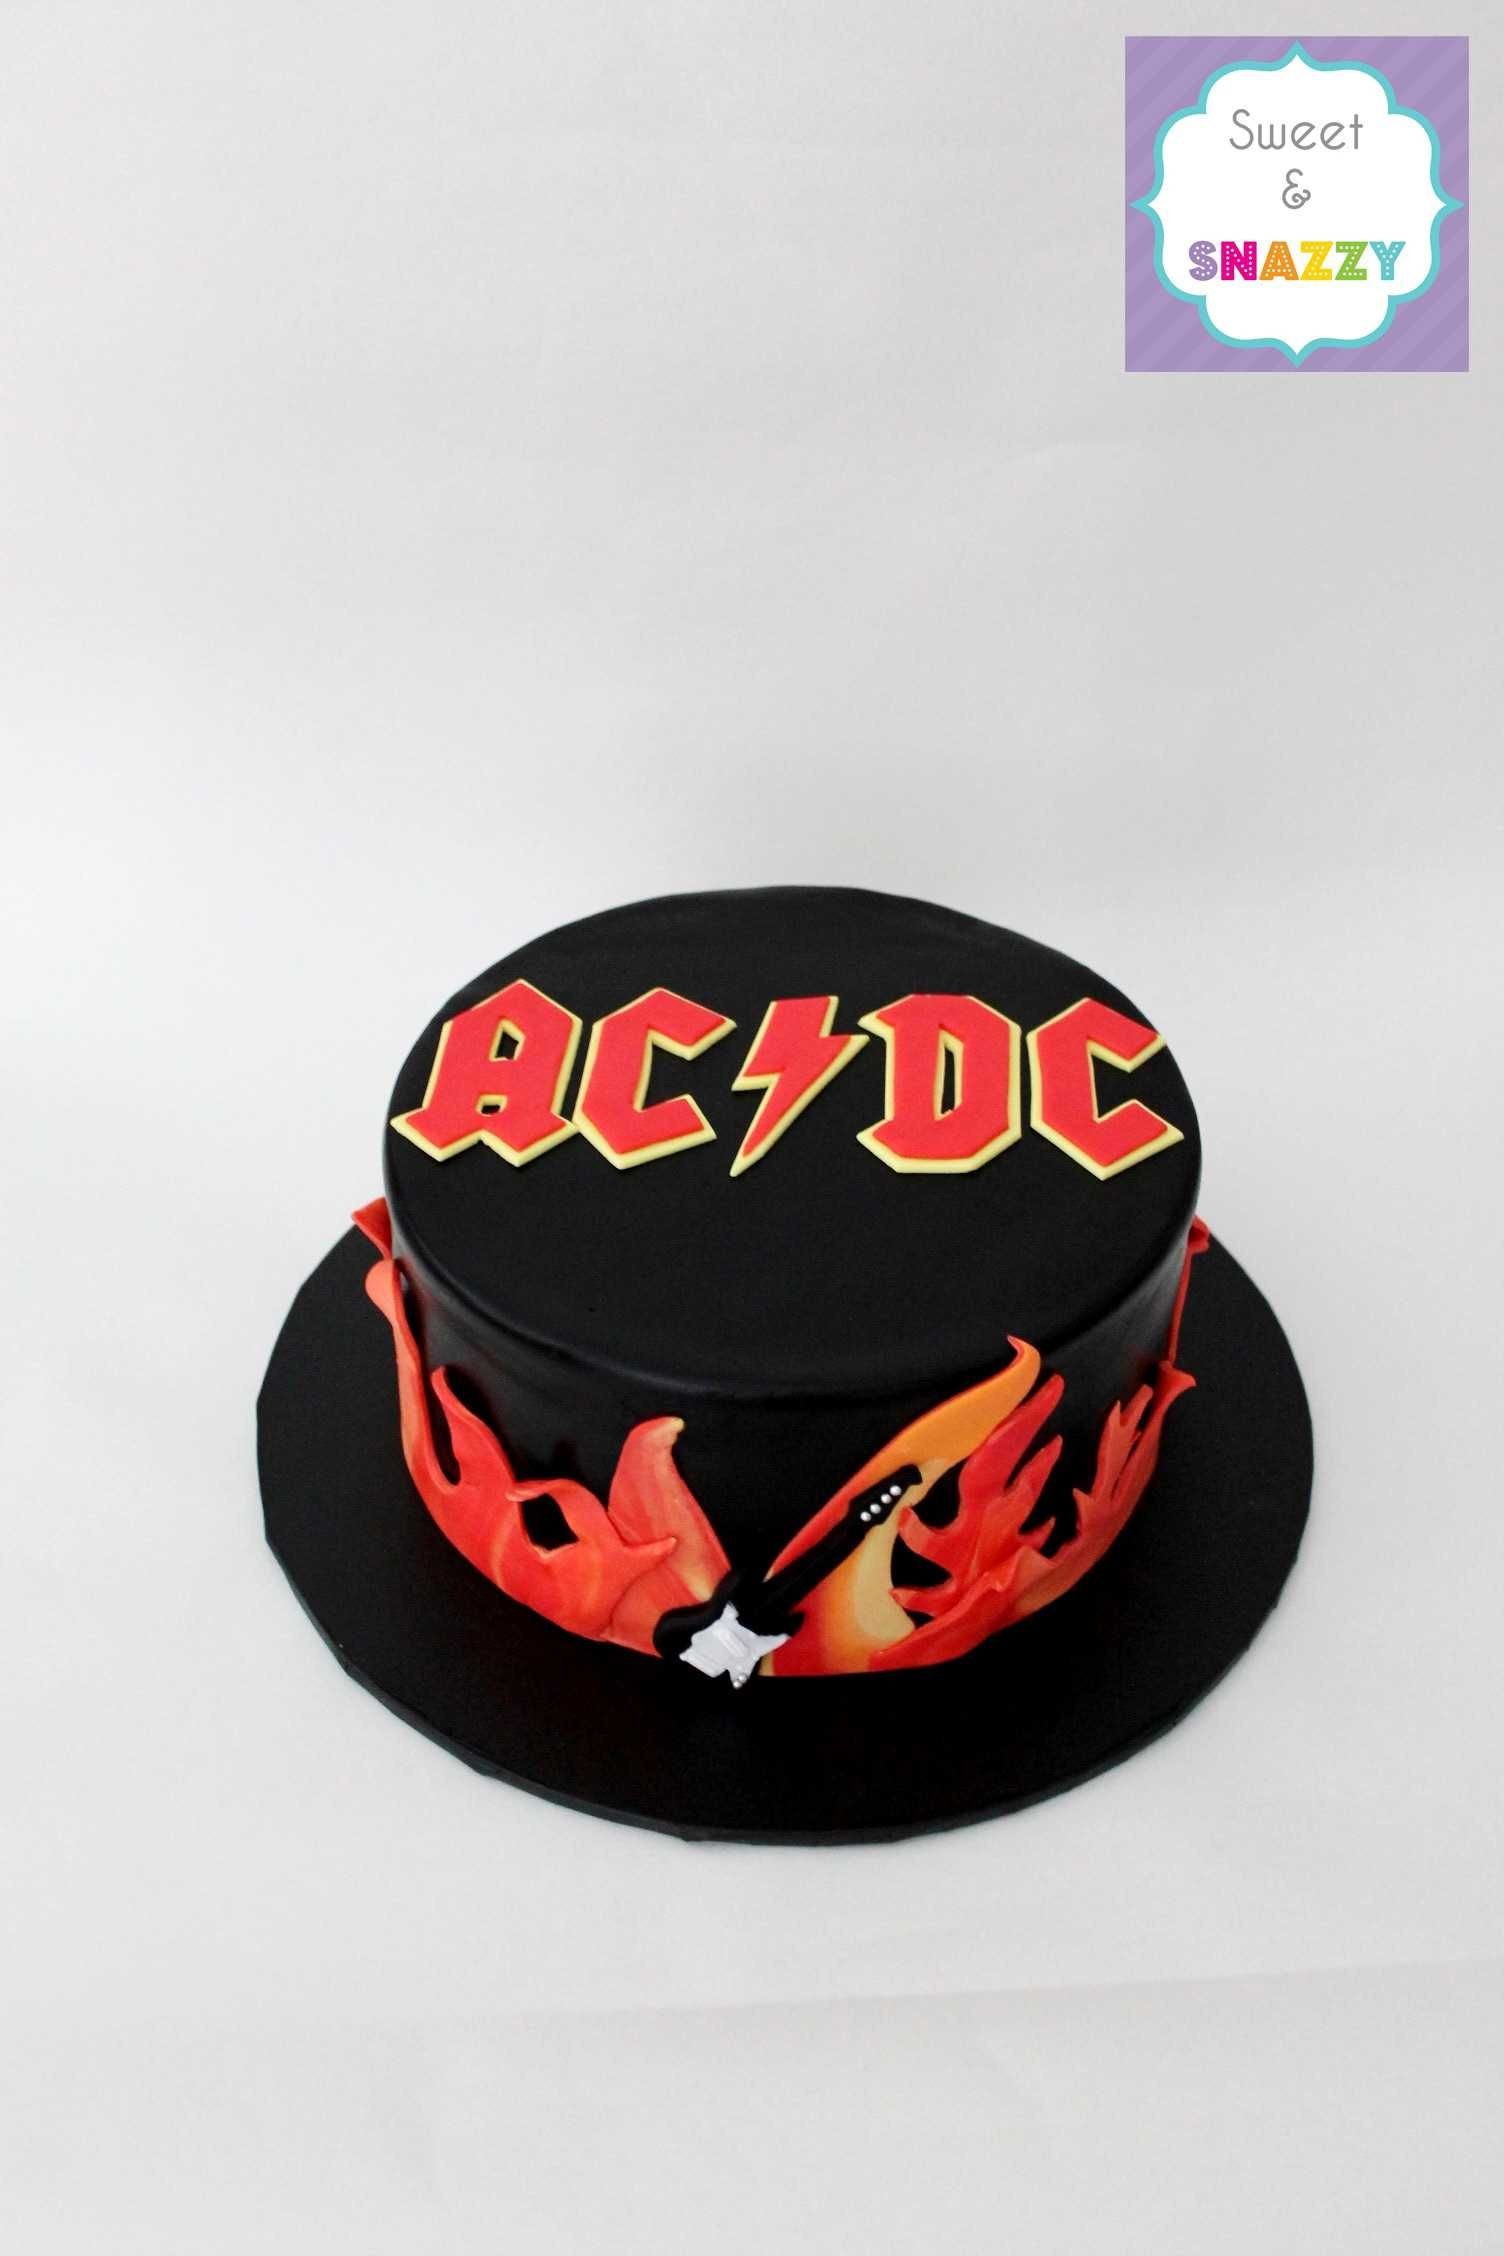 Heavy metal cake Cake Birthdays and Music cakes